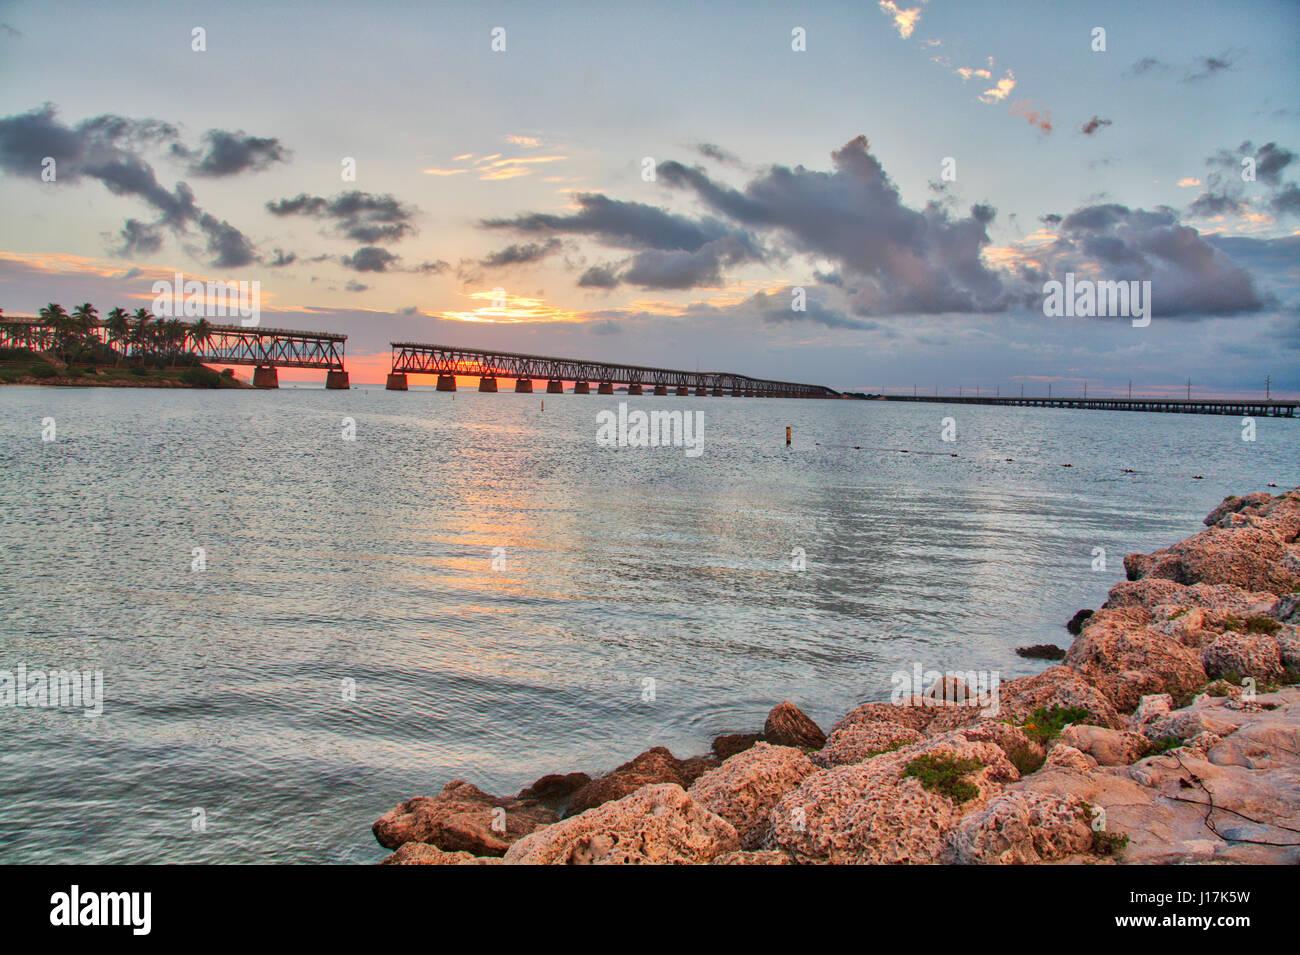 Sunset over the old railroad bridge at Bahia Honda State Park, Florida Keys Stock Photo